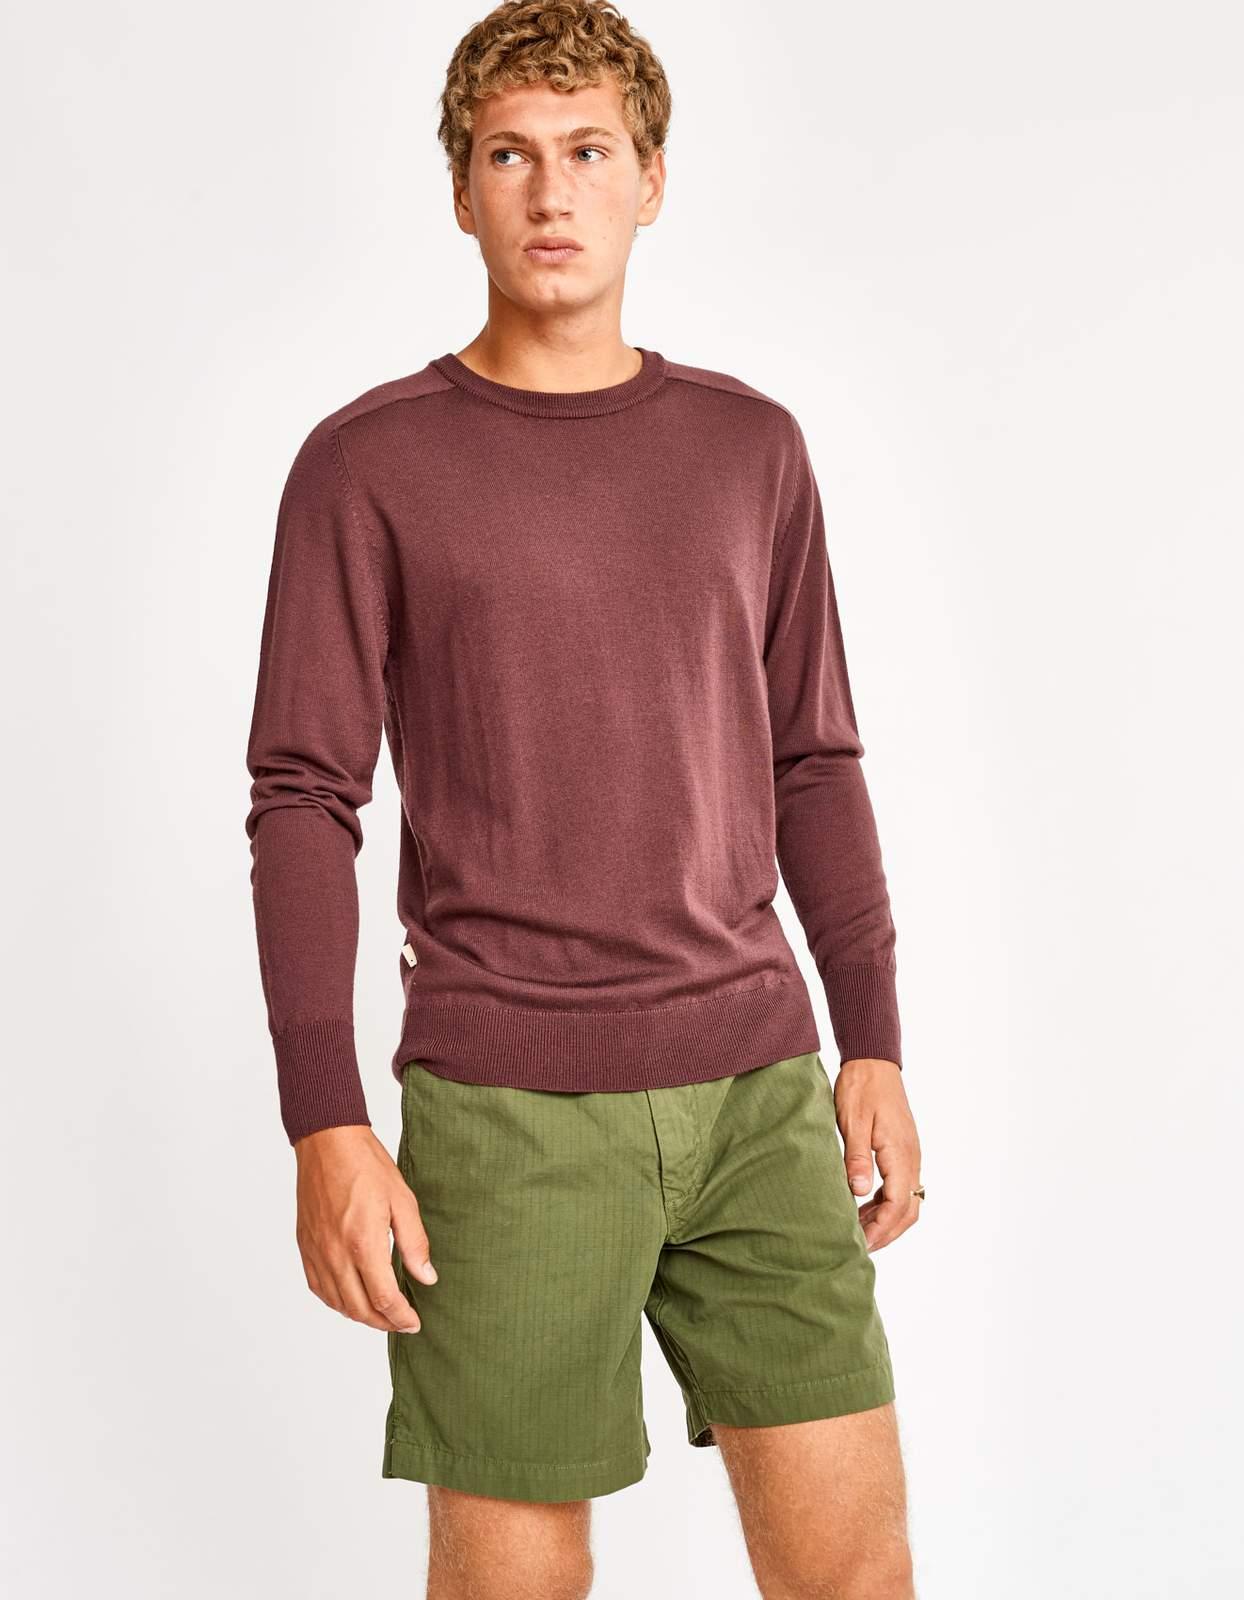 BLR-knitwear-dosaz-k0927u-burlwood_9_1600x1600.jpg